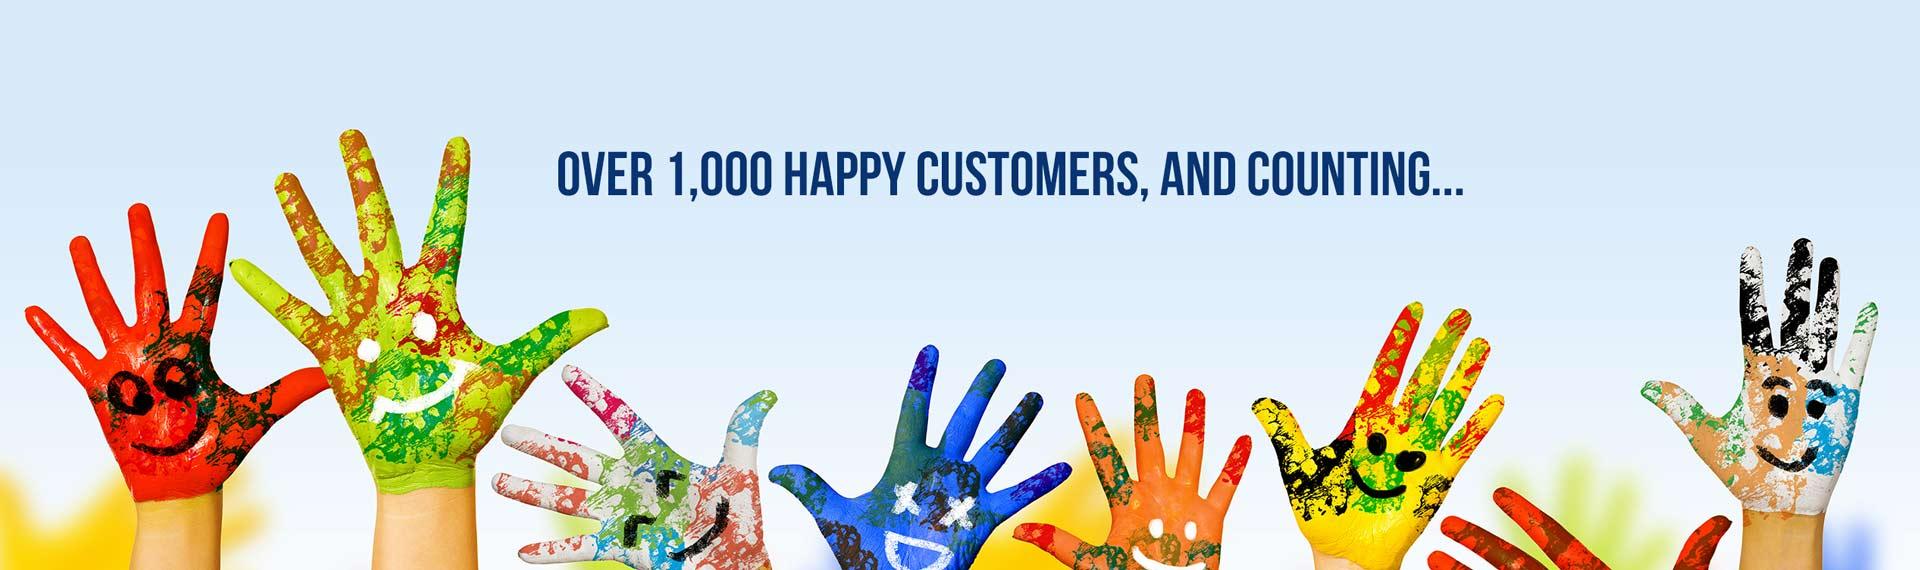 happy-customers2